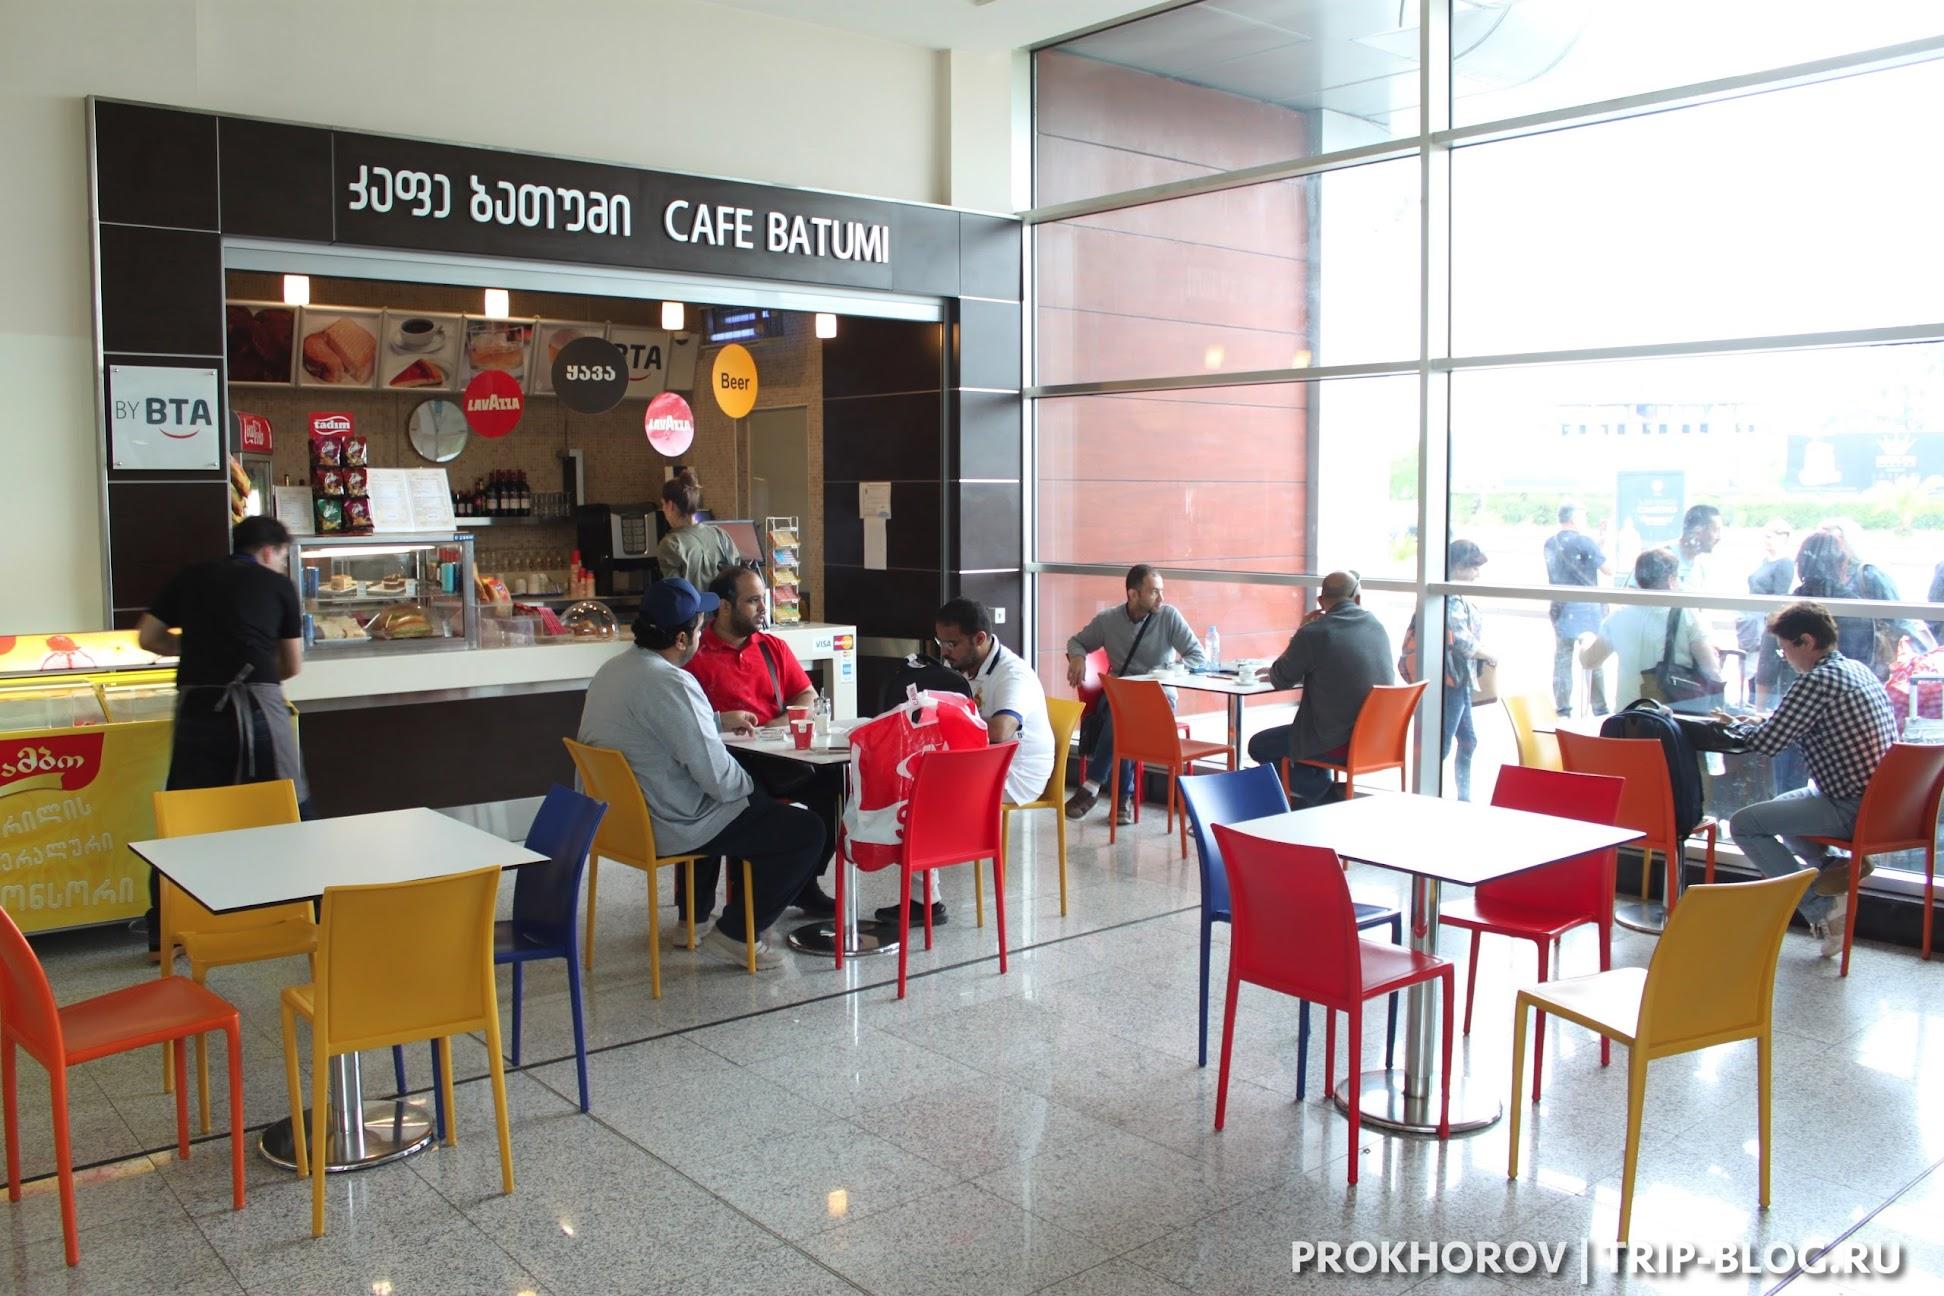 аэропорт батуми прилеты